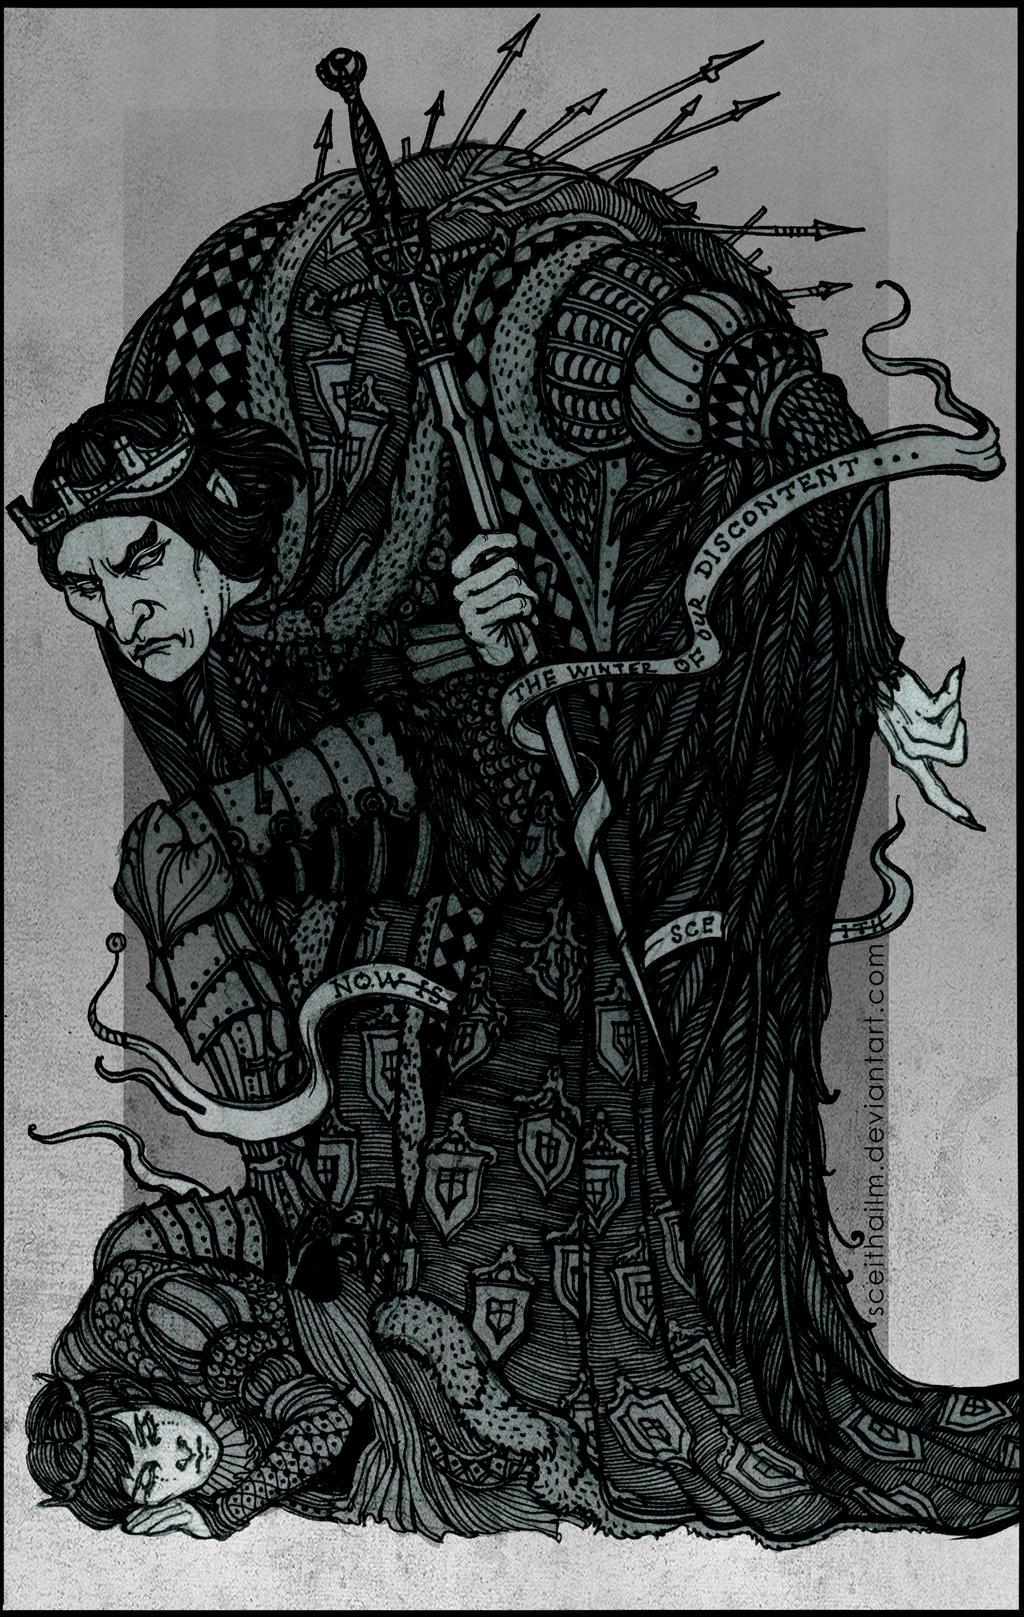 King Richard III by Sceith-A